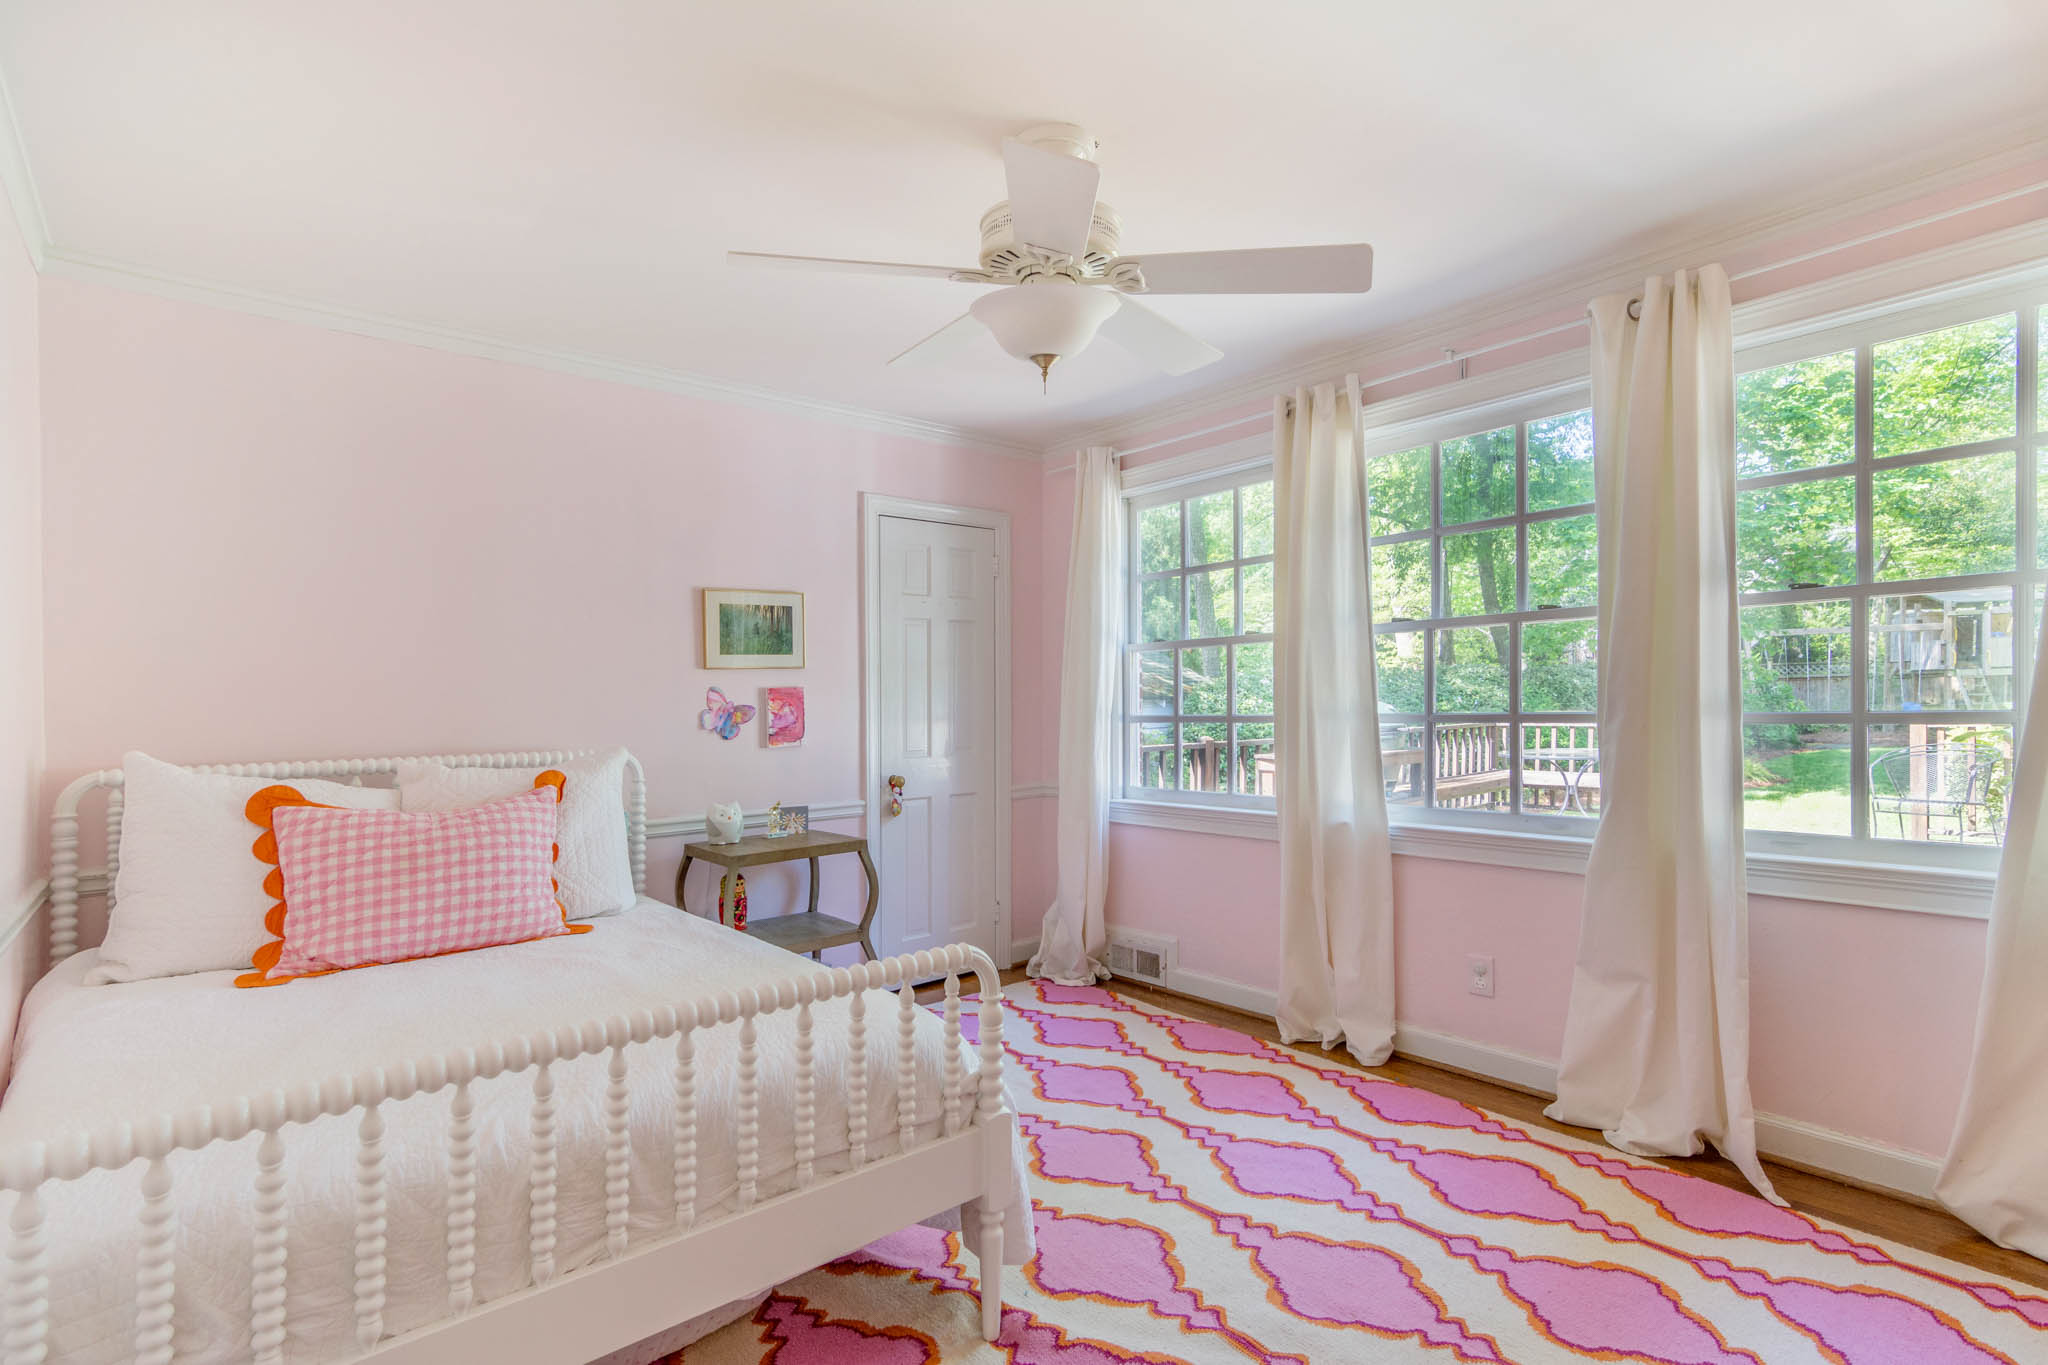 real_estate_photographer_bedroom_photography-3.jpg